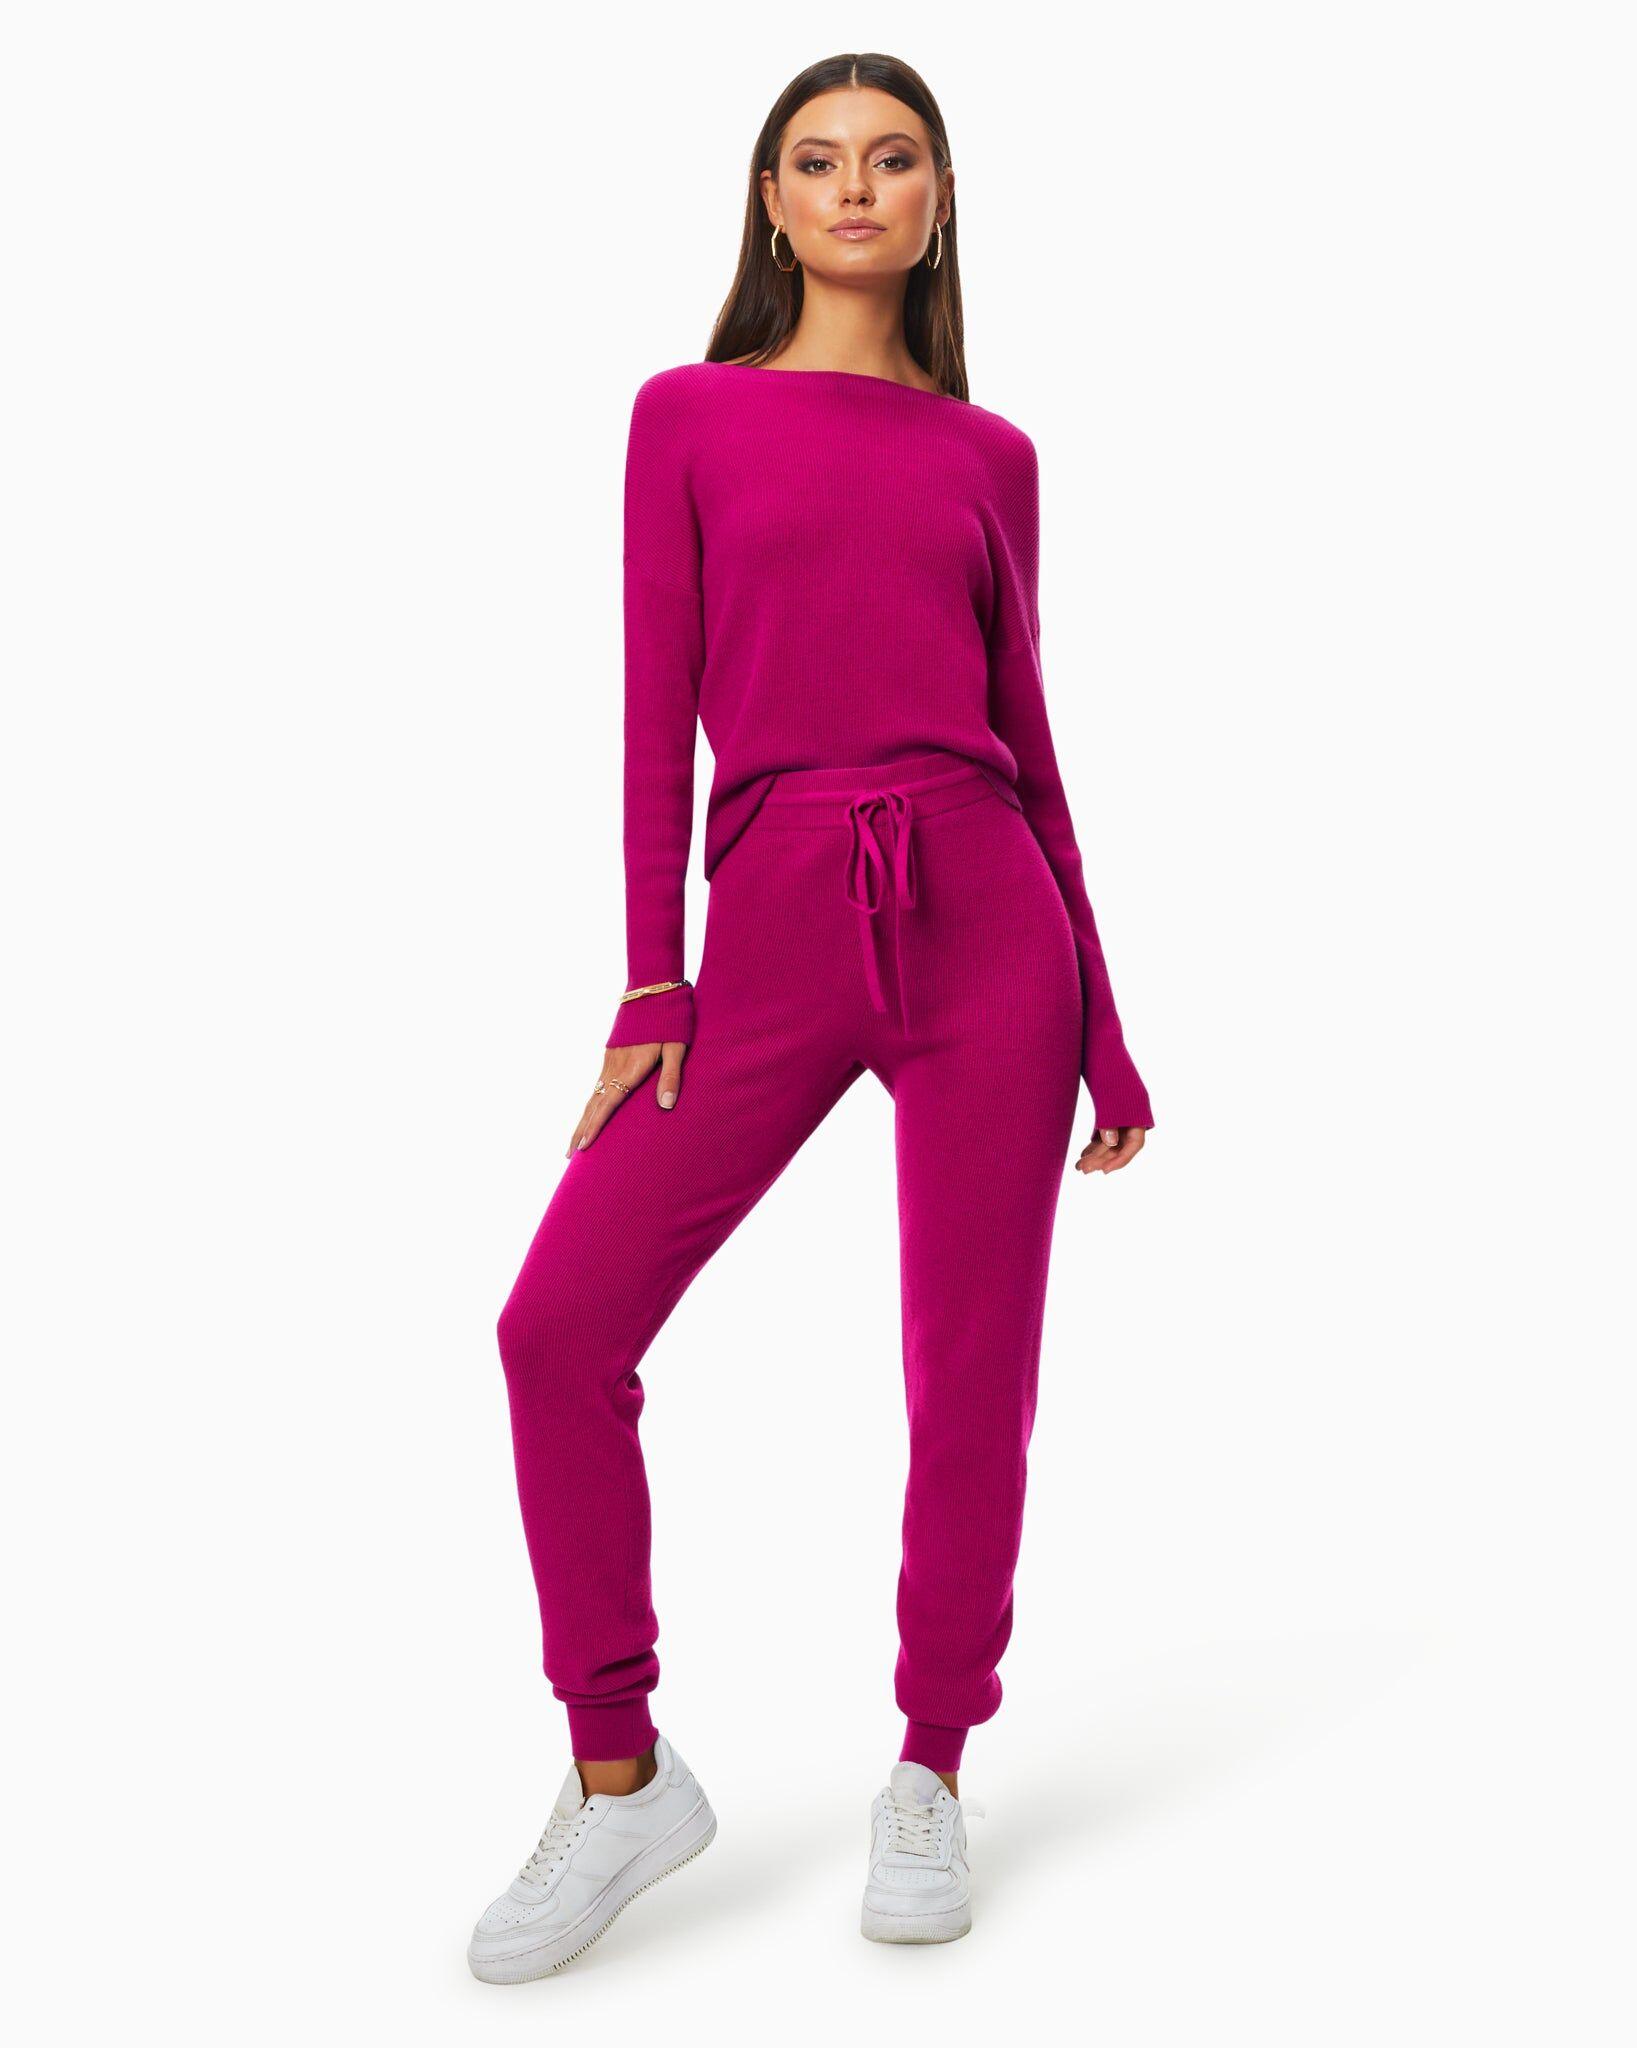 Landon Knit Jogger in Diva Pink - Diva Pink - Size: XL